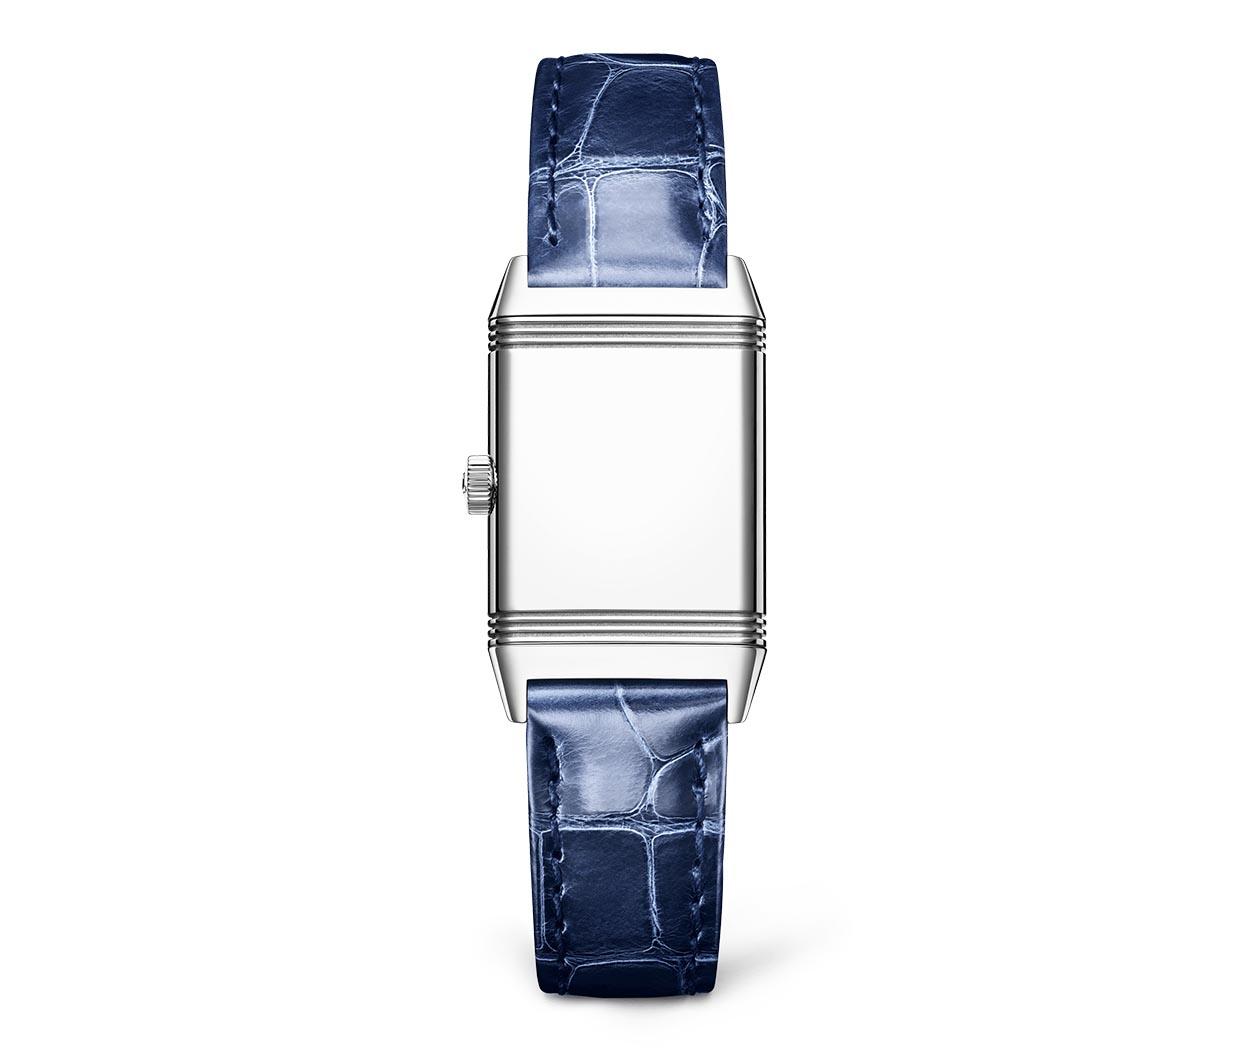 JaegerLeCoultre Reverso ClassicSmall 2618540 Carousel 3 FINAL